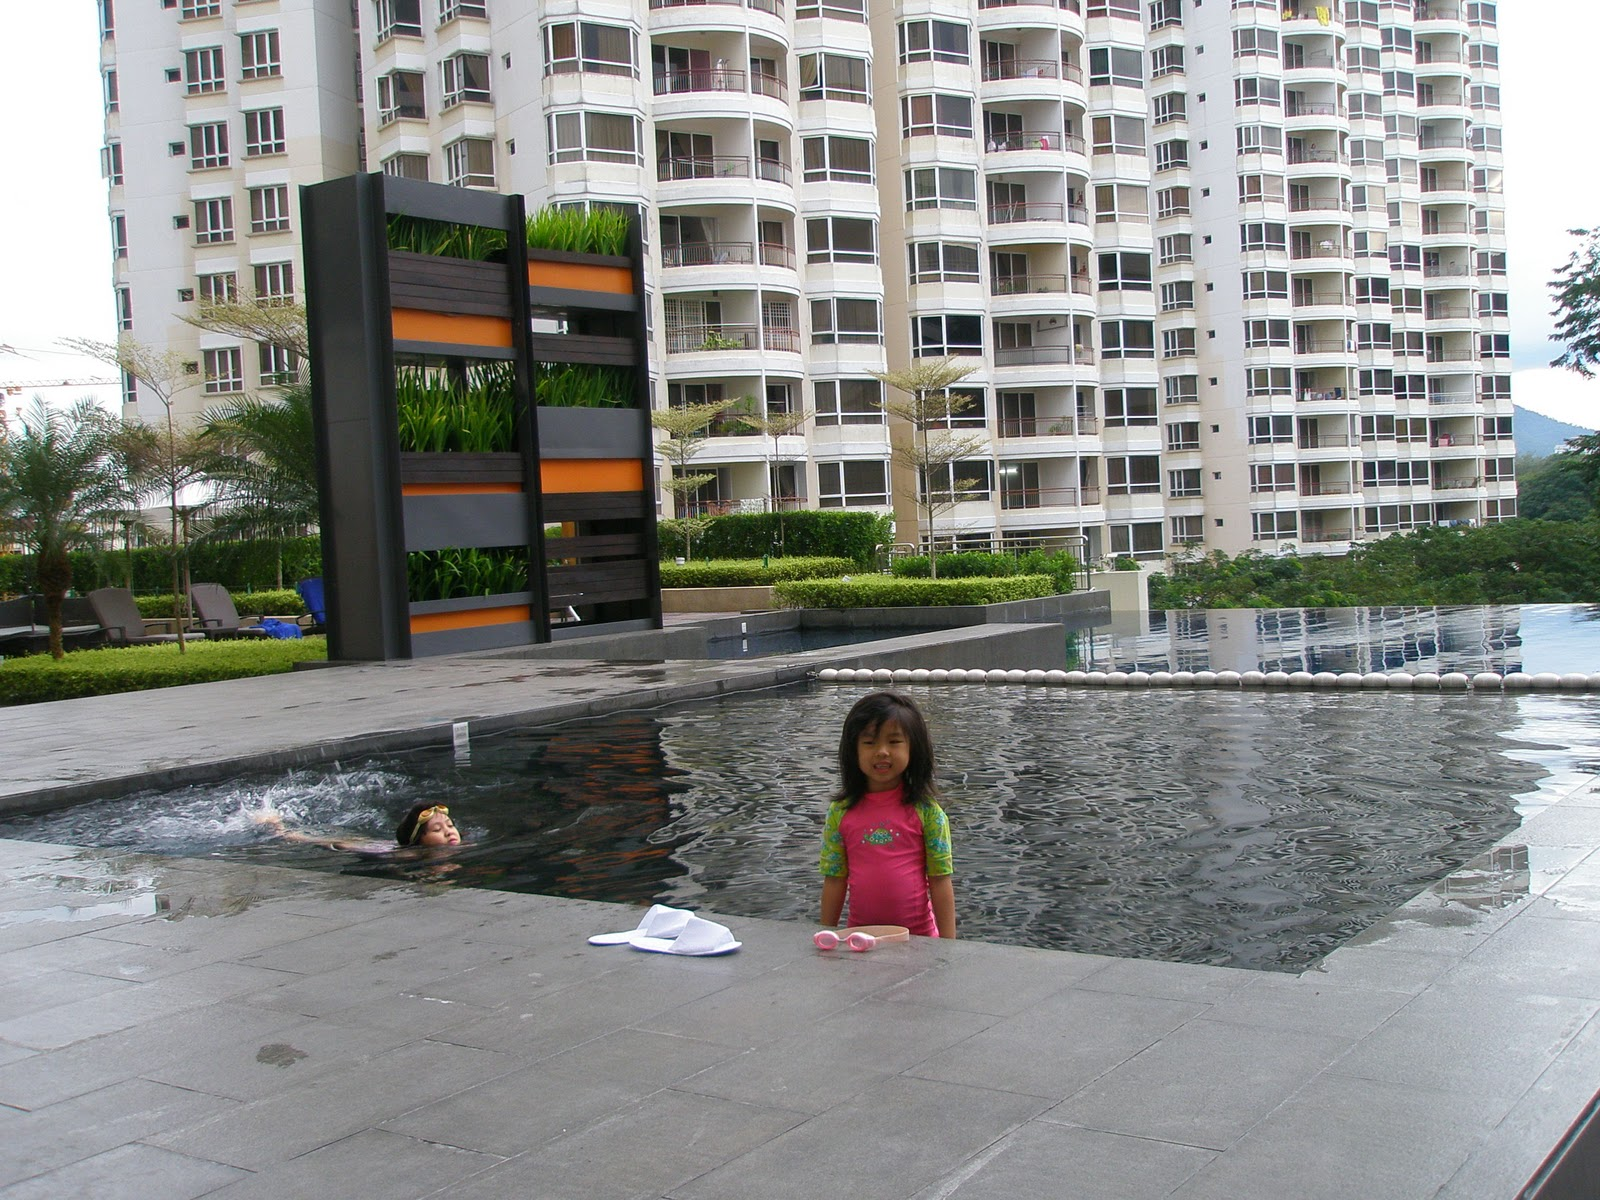 Health freak mommy pool side fun at g hotel and gurney hotel penang for Gurney hotel penang swimming pool